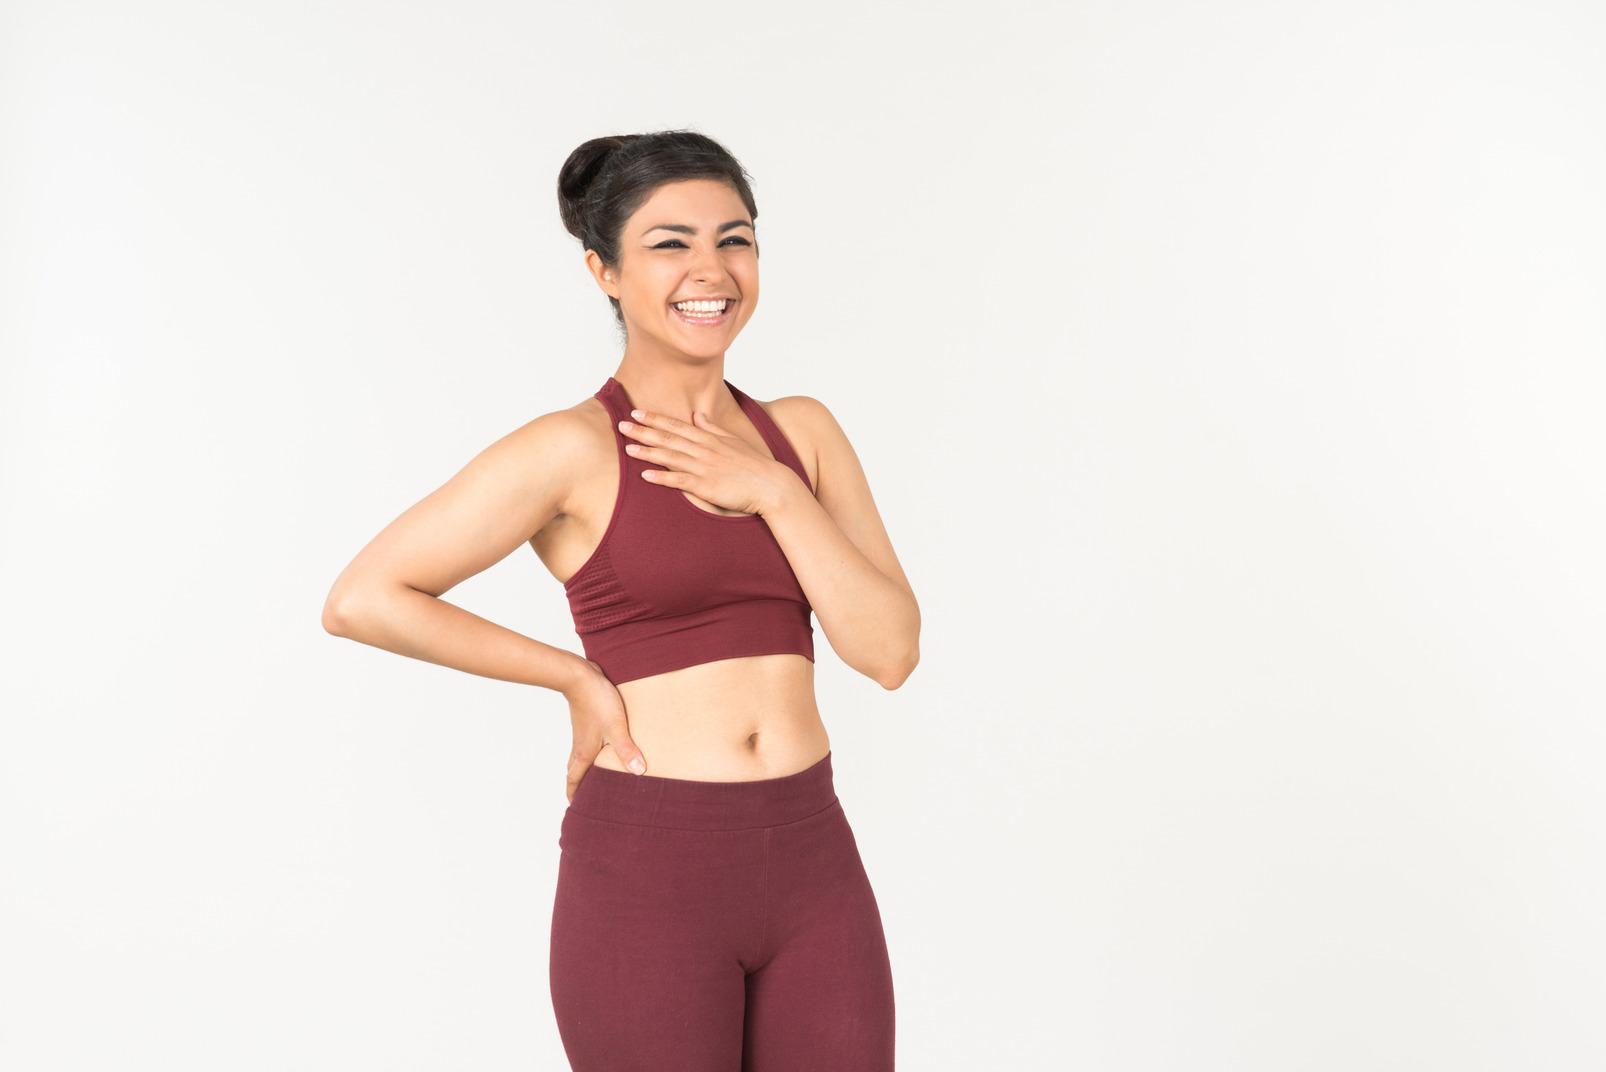 Indian girl in sporstwear checking fitness tracker